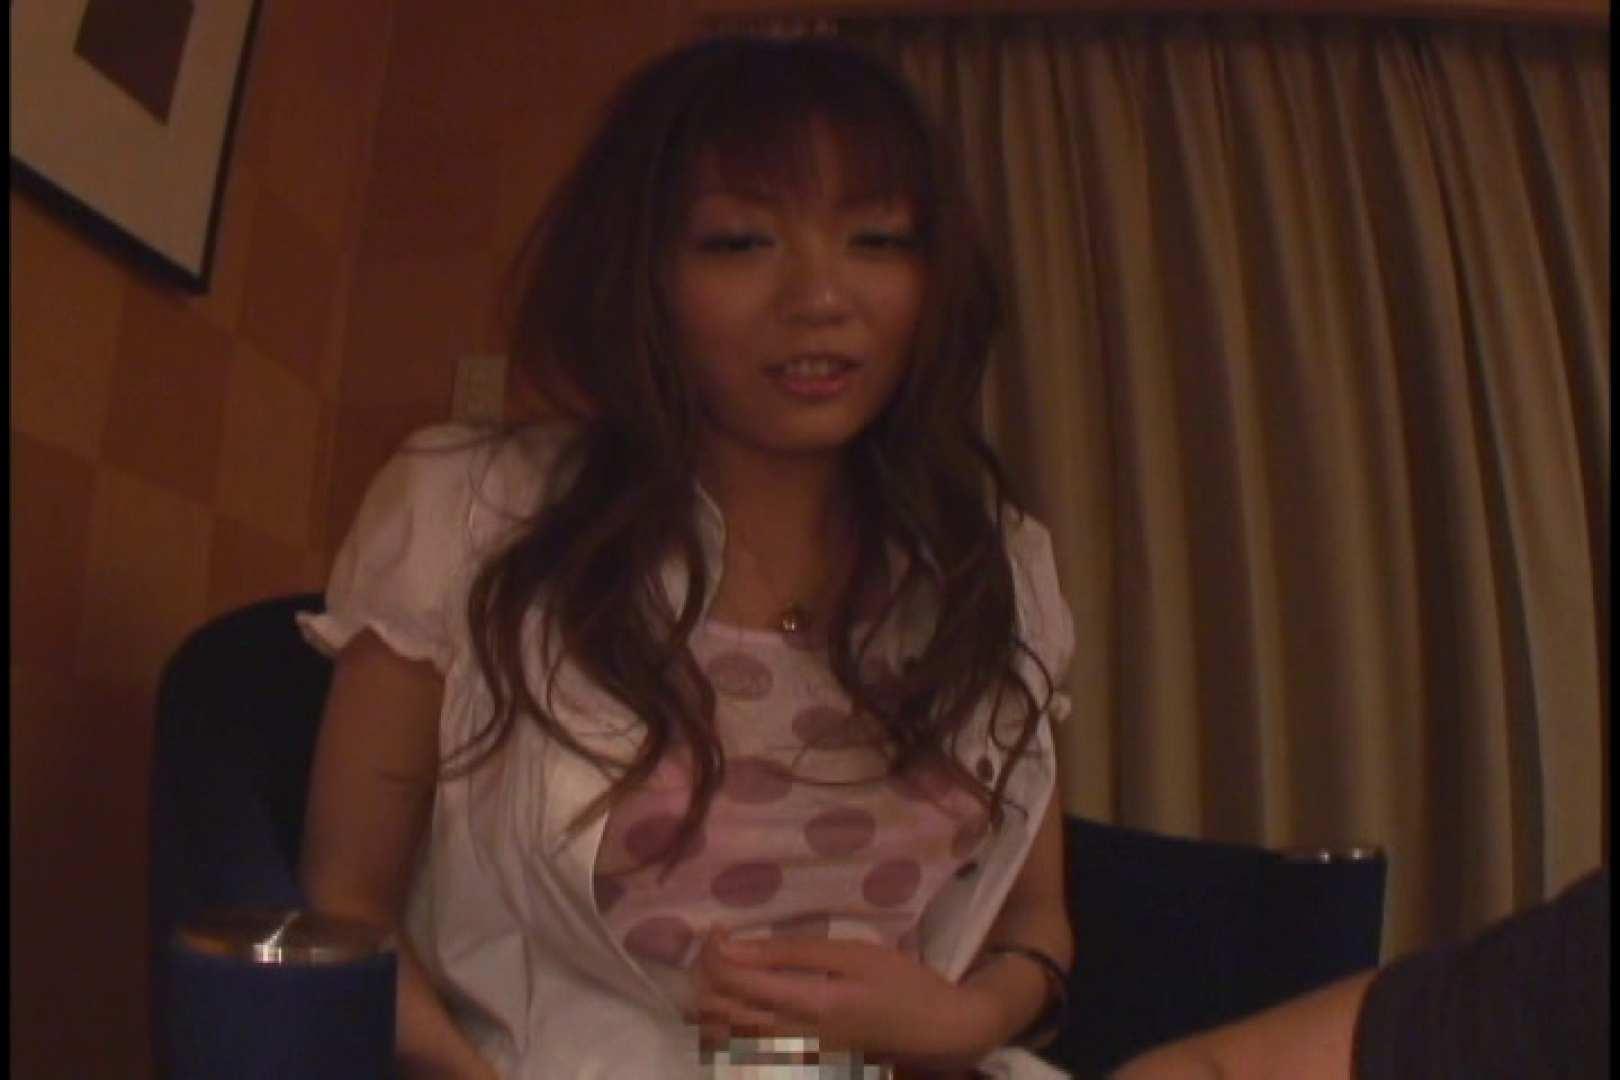 JDハンター全国ツアー vol.001 前編 美しいOLの裸体   女子大生丸裸  92pic 63